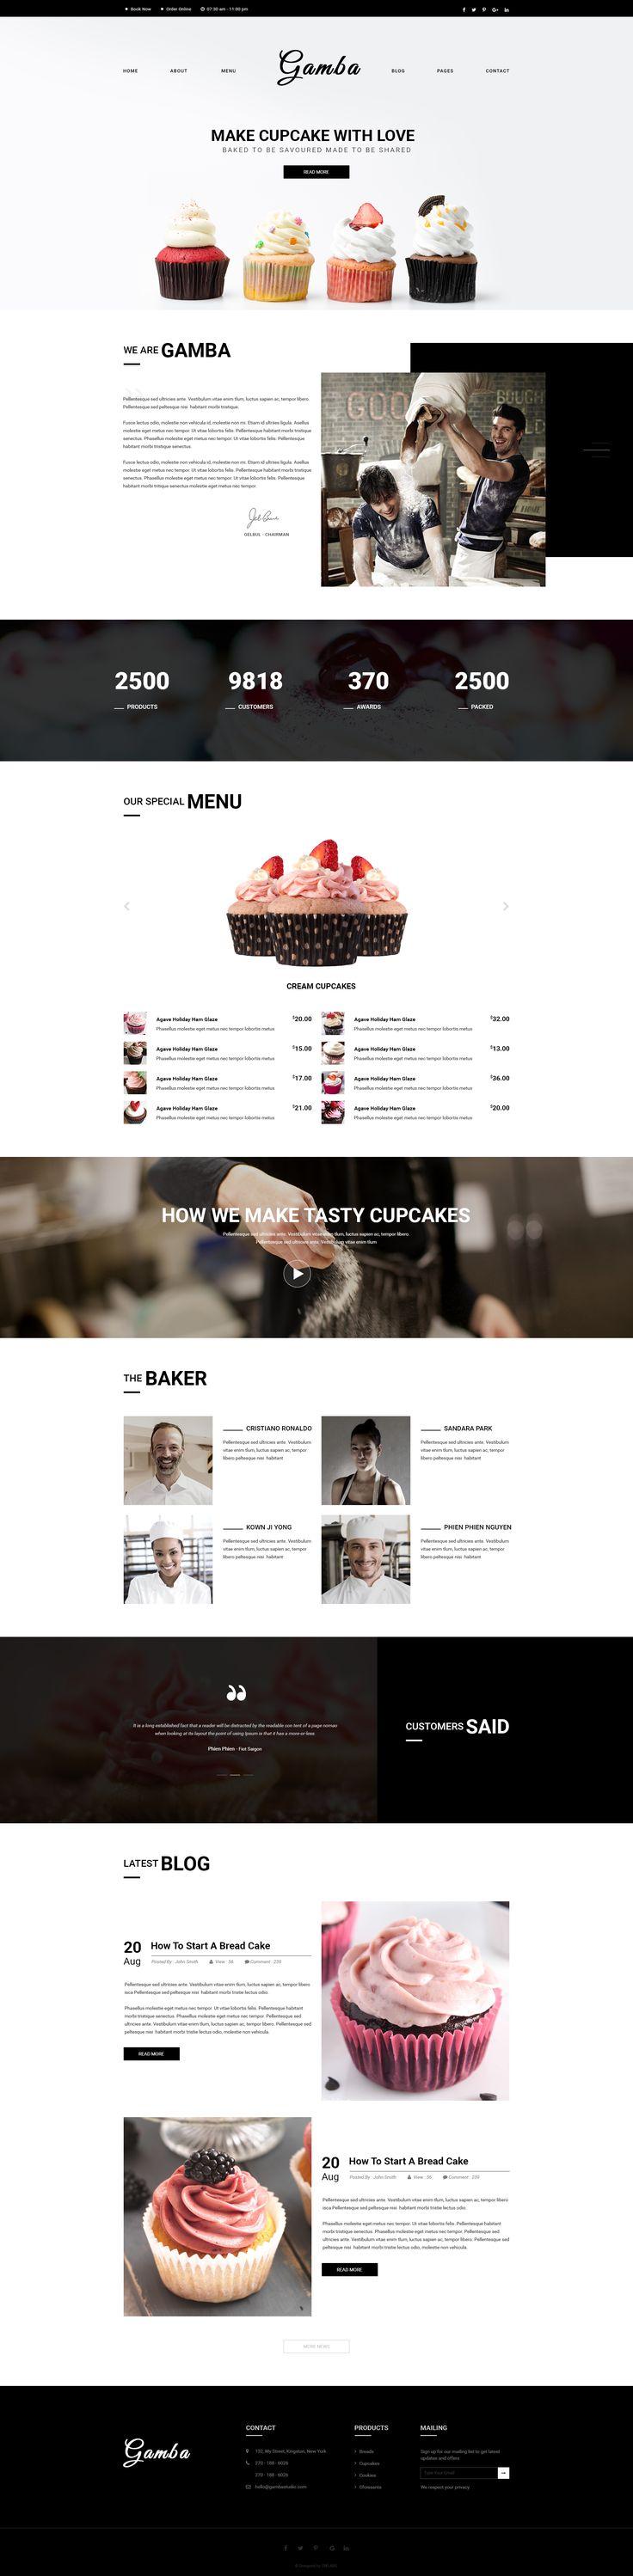 Gamba Bakery, Cakery, Pizza & Pastry Shop PSD Template